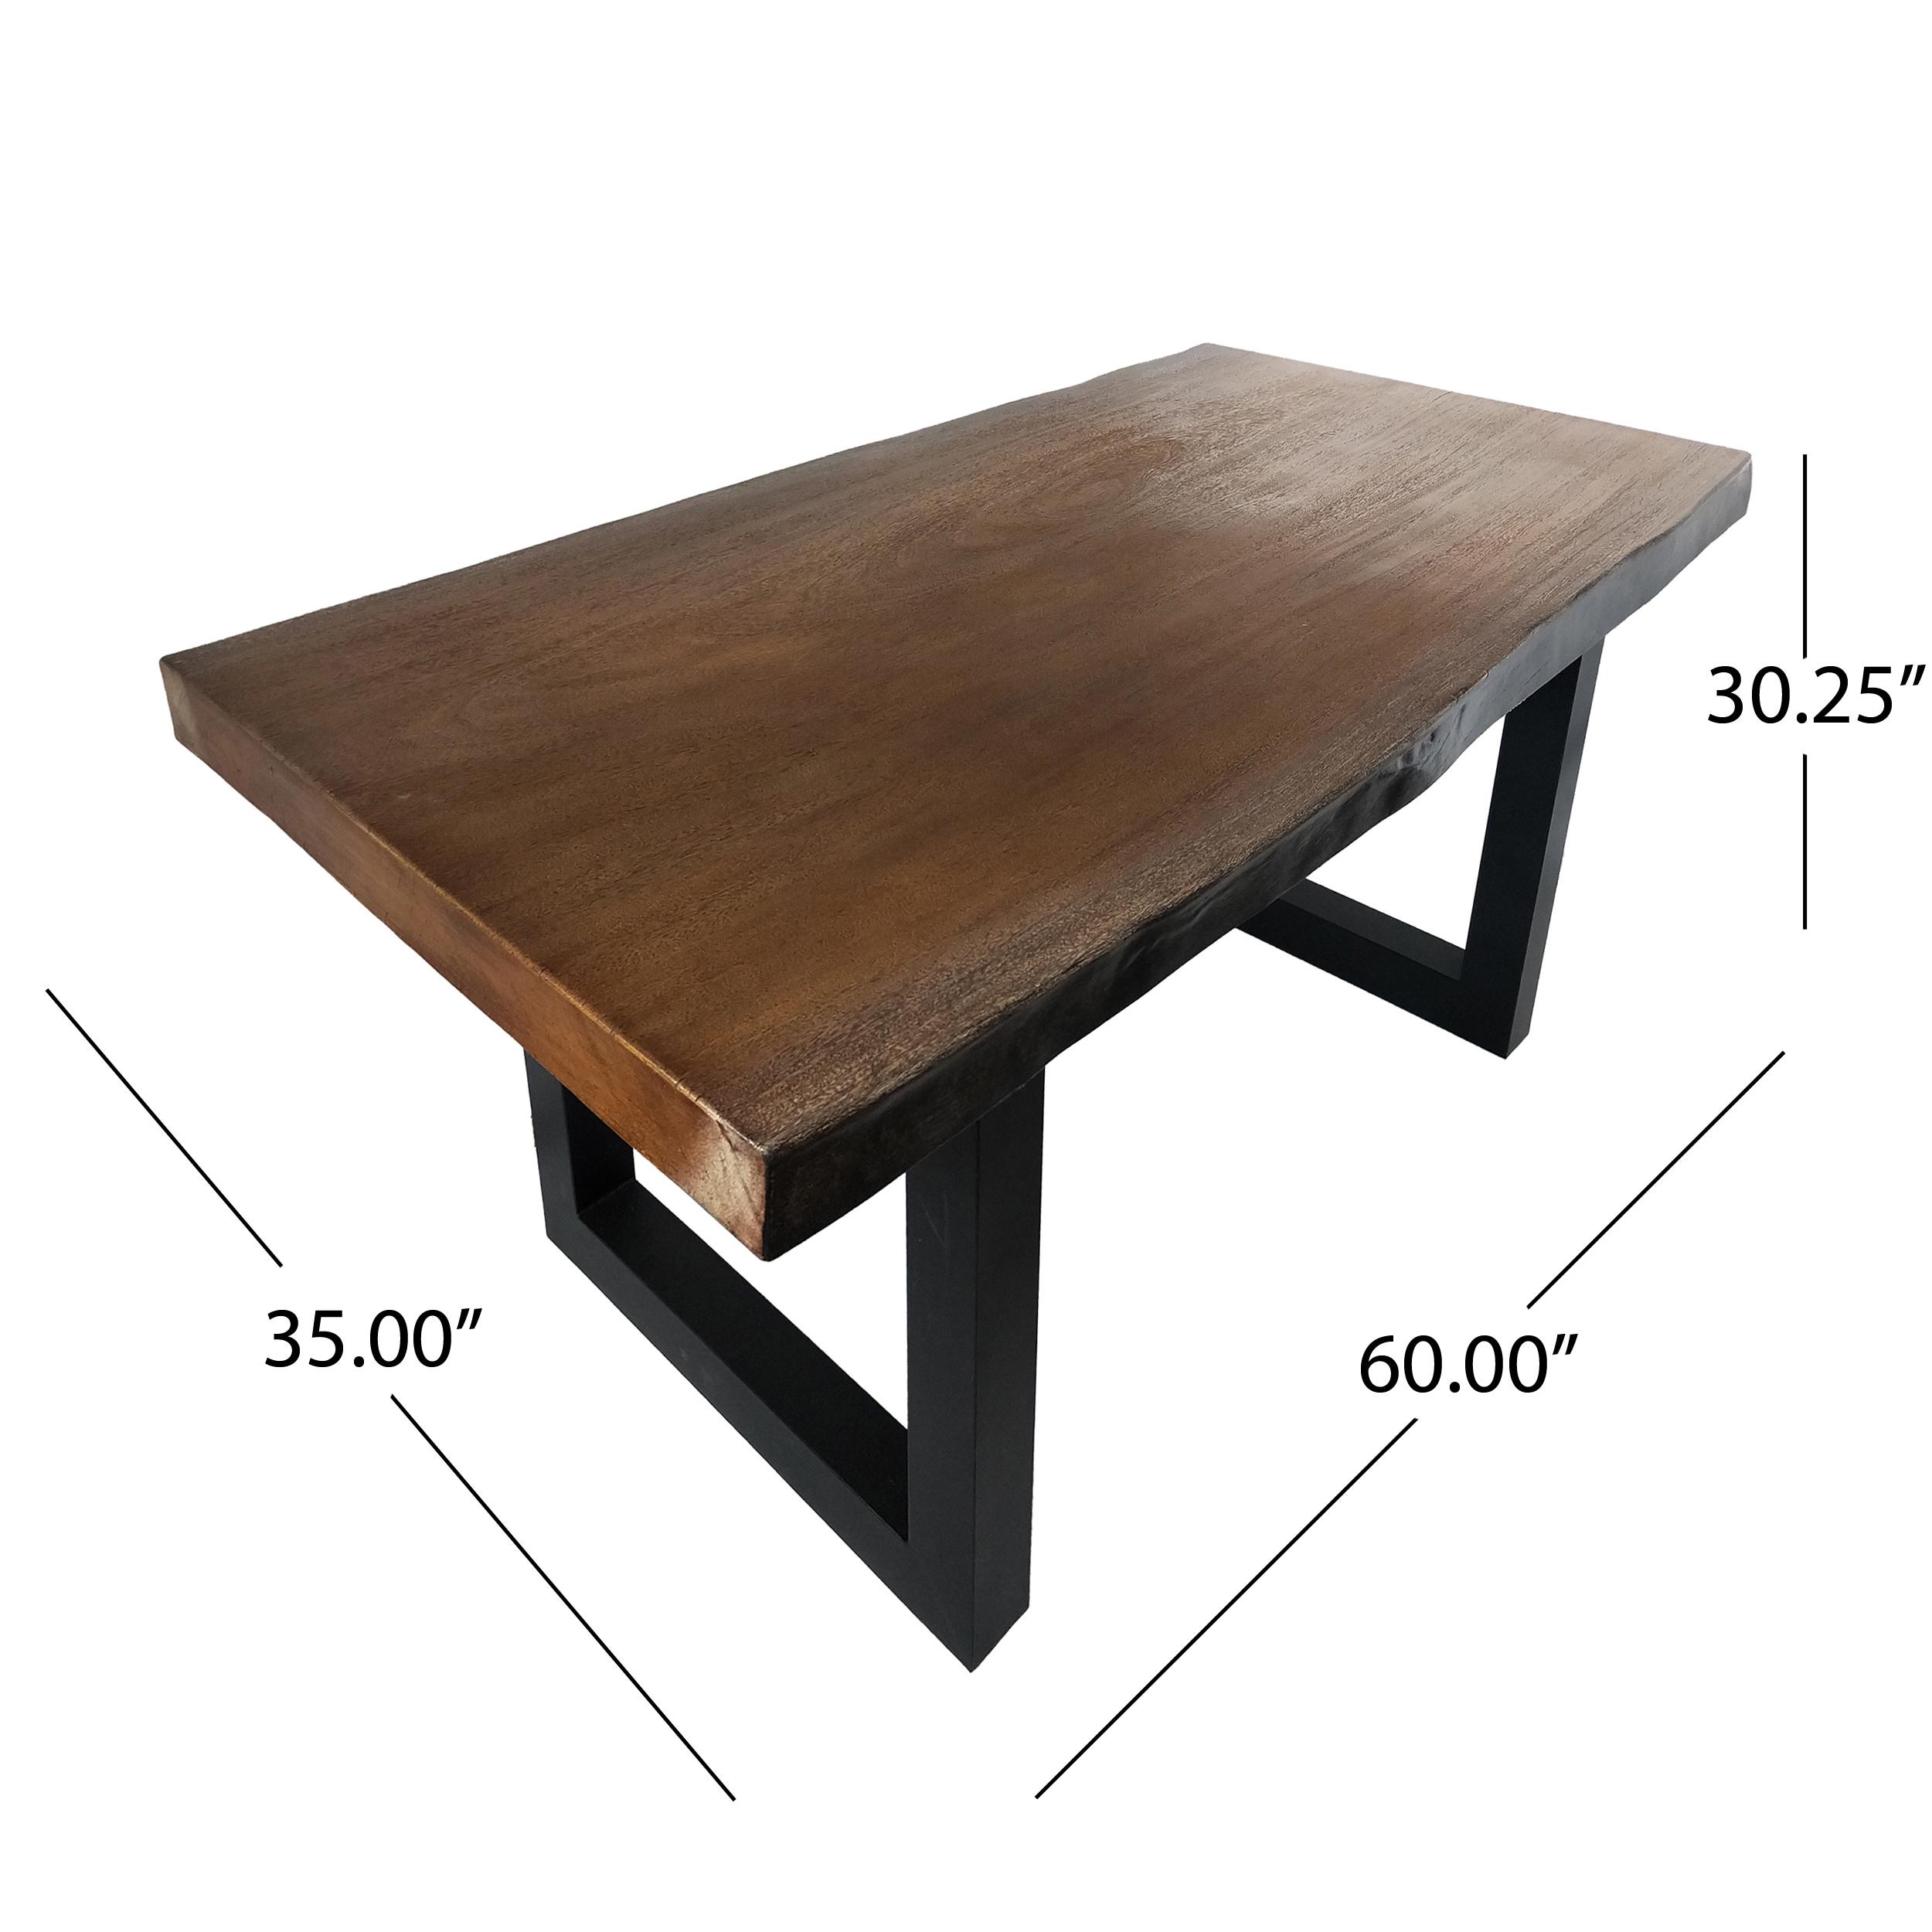 design dinning edge osborne legs videos table live dining wood features